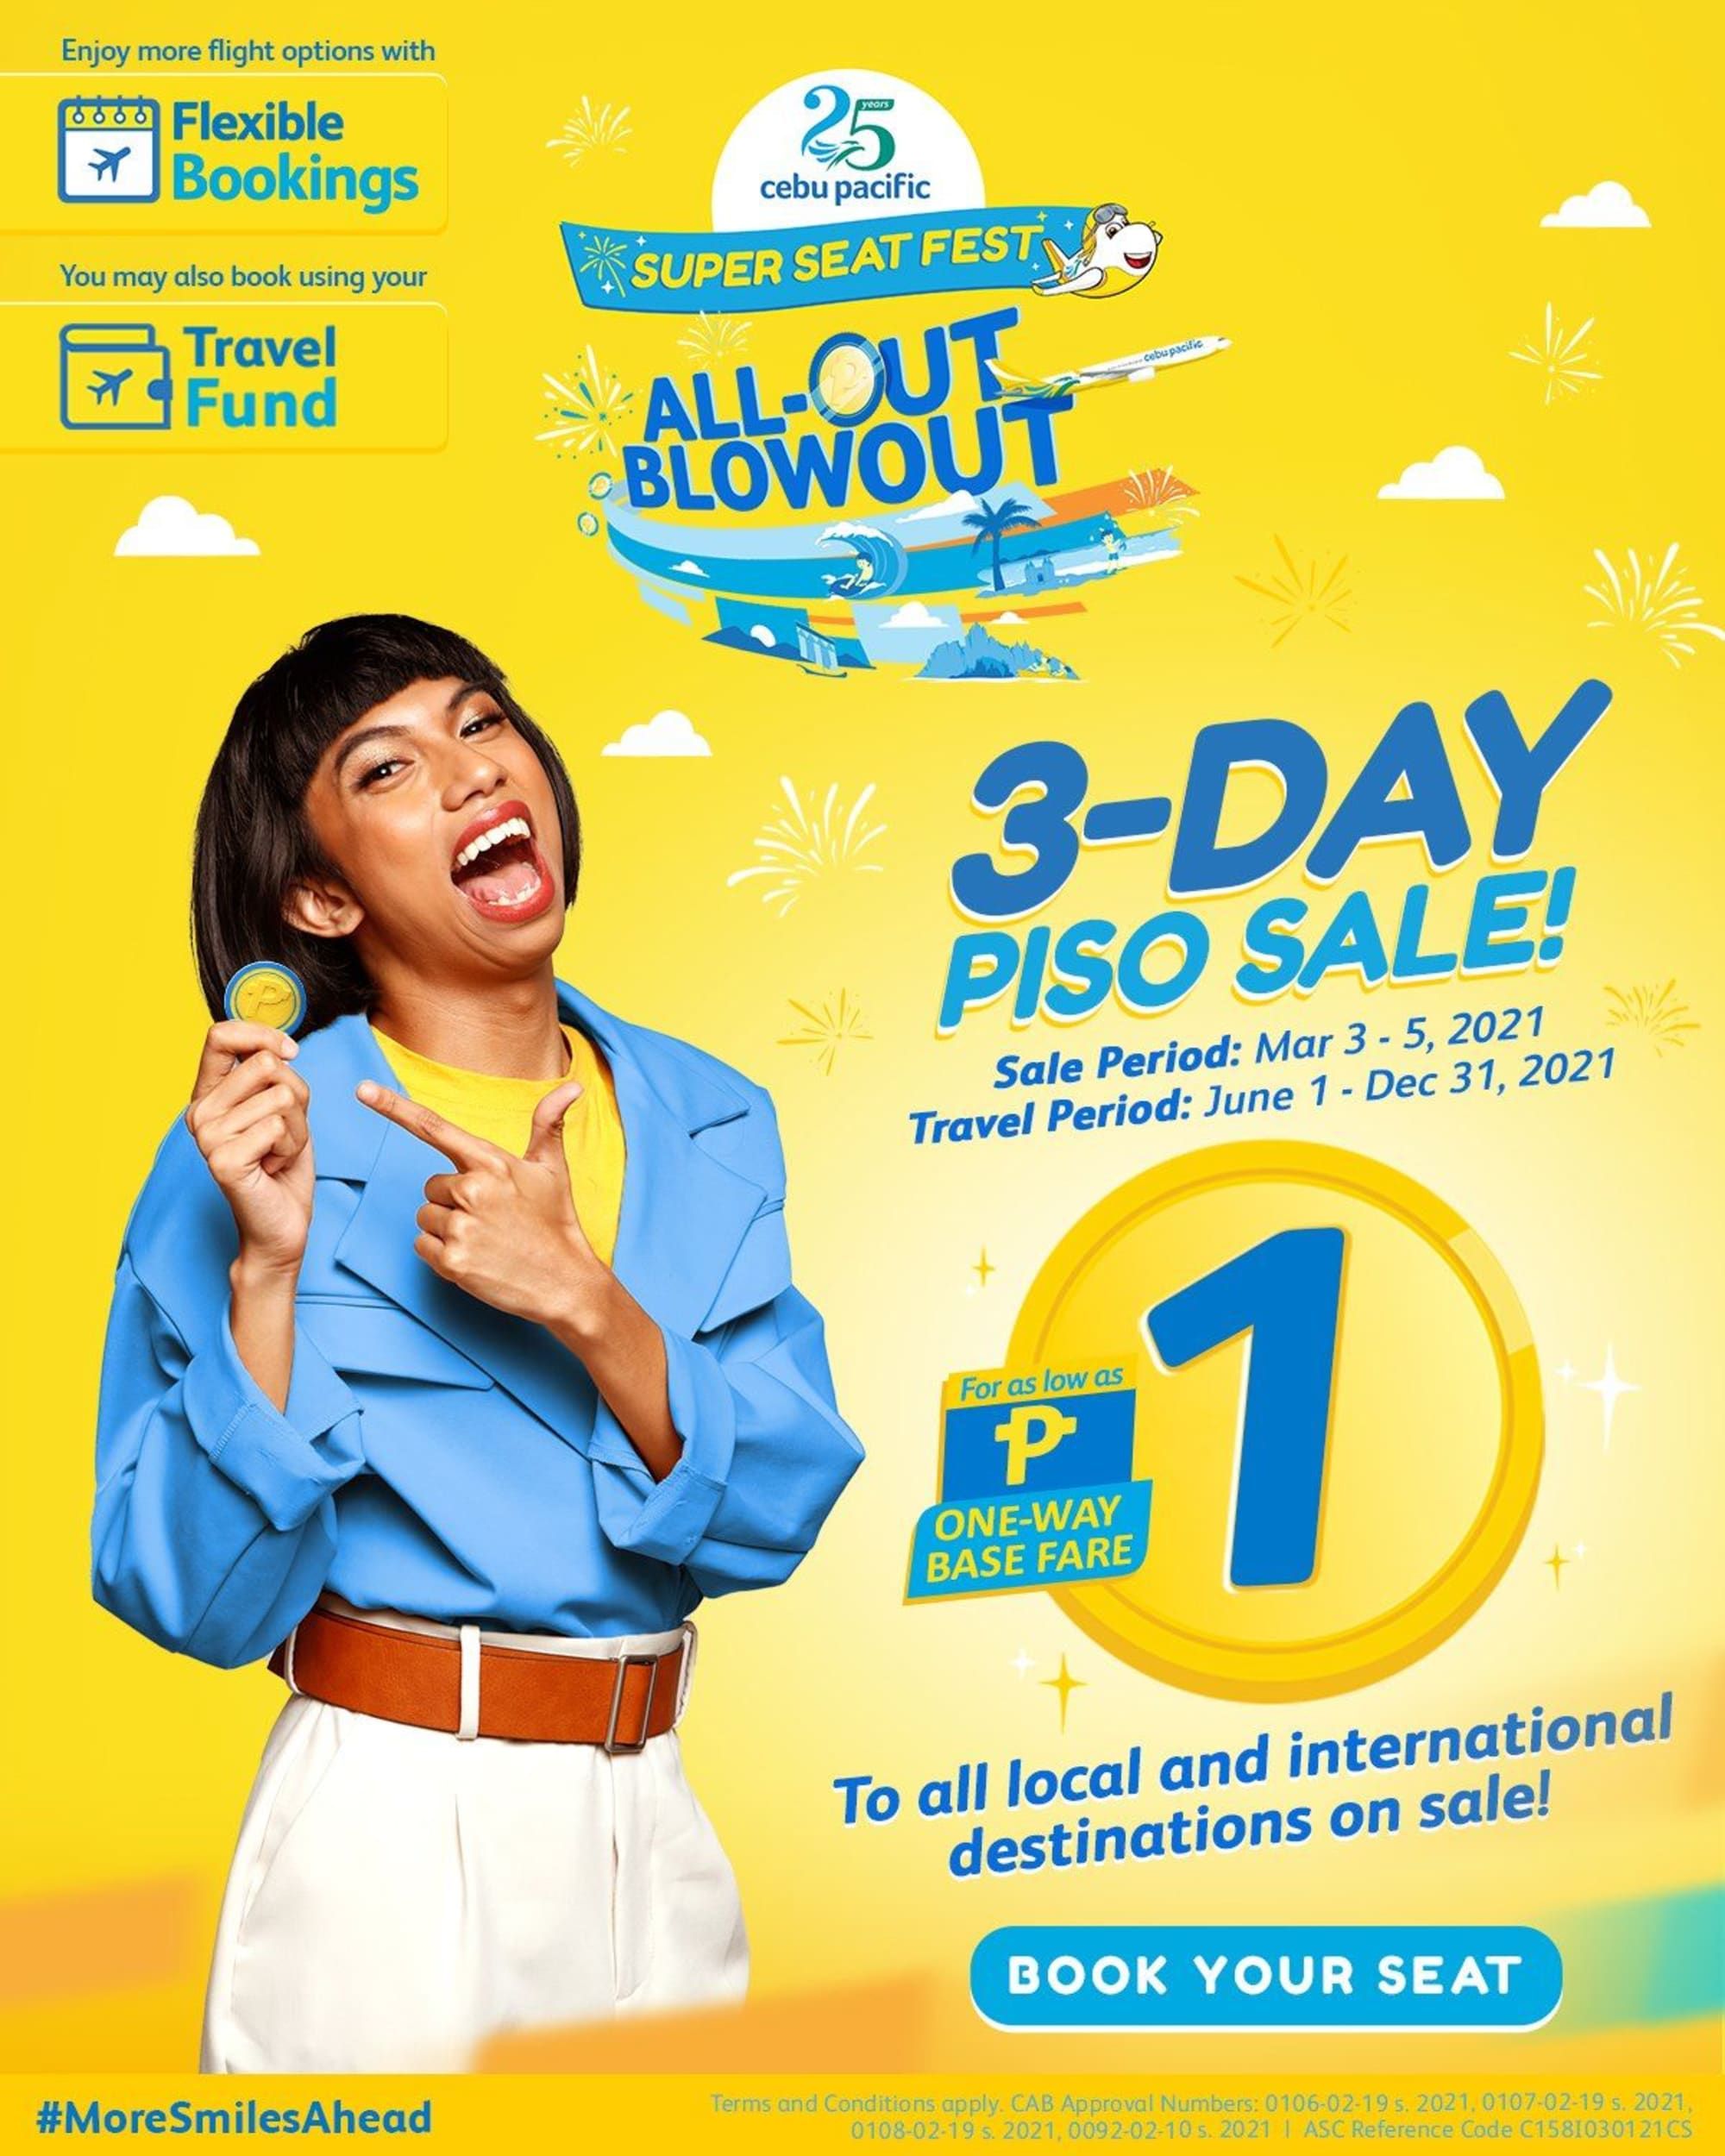 Cebu Pacific announces ₱1 Seat Sale Today March 3